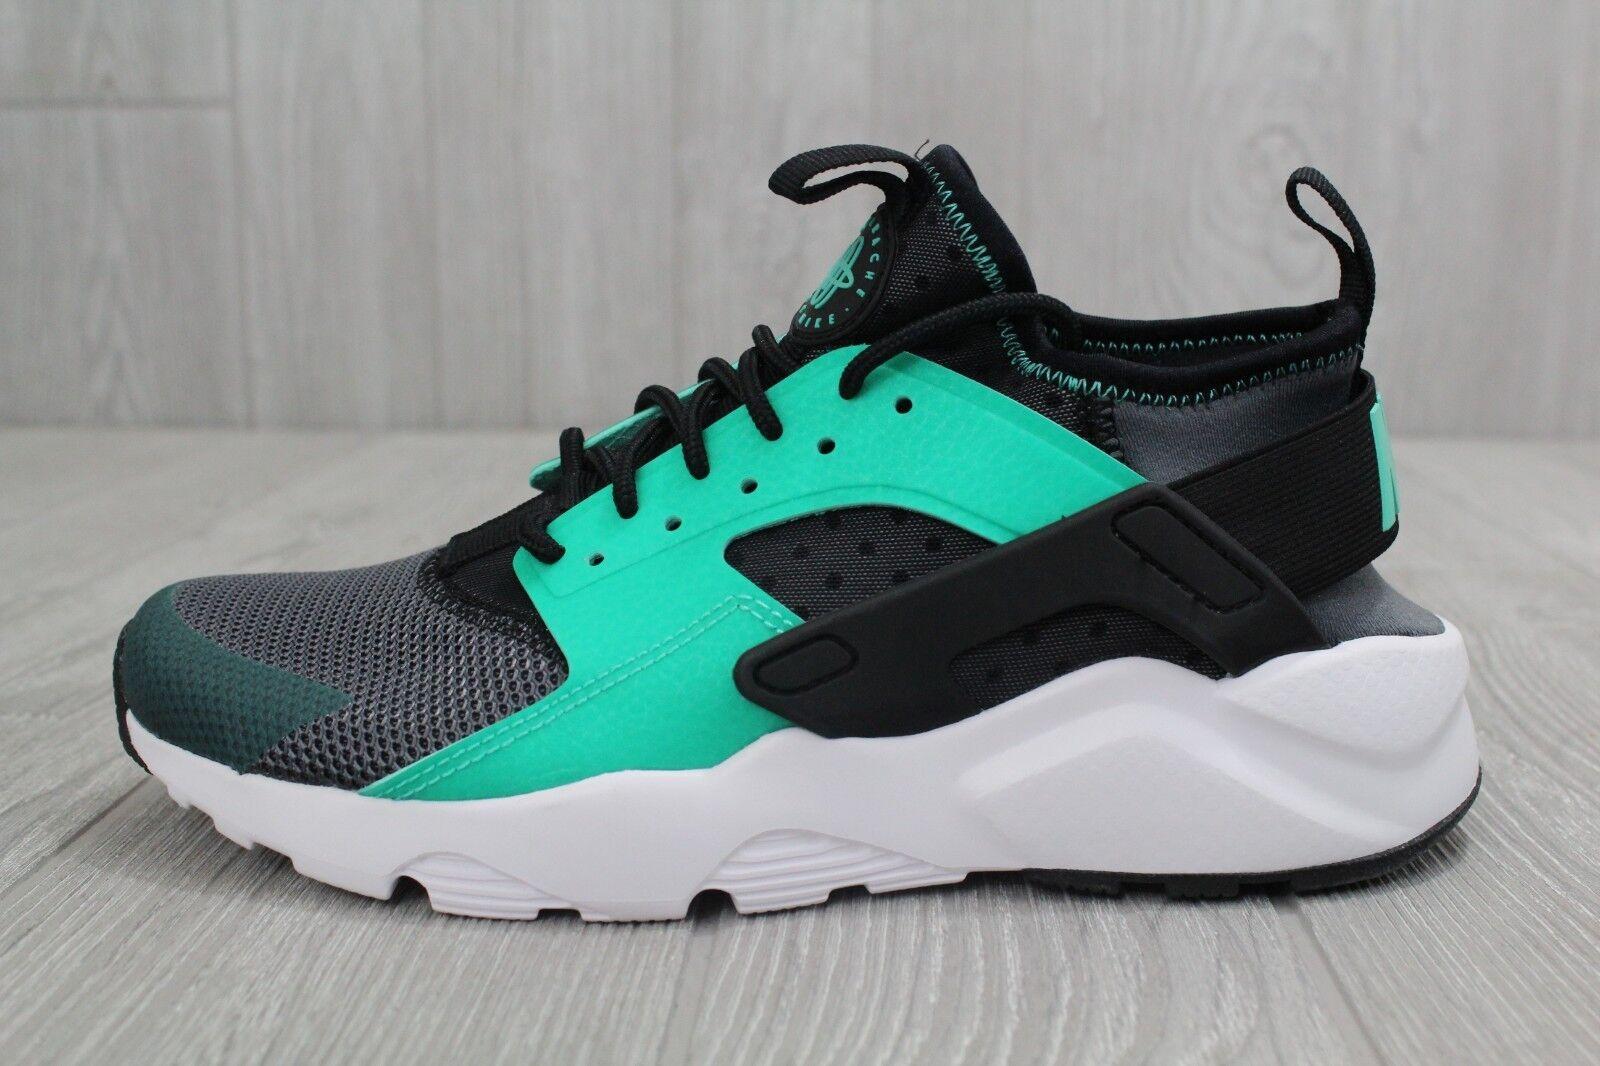 27 Nike Air Huarache Basketball Shoes Training Green Black Mens 6.5